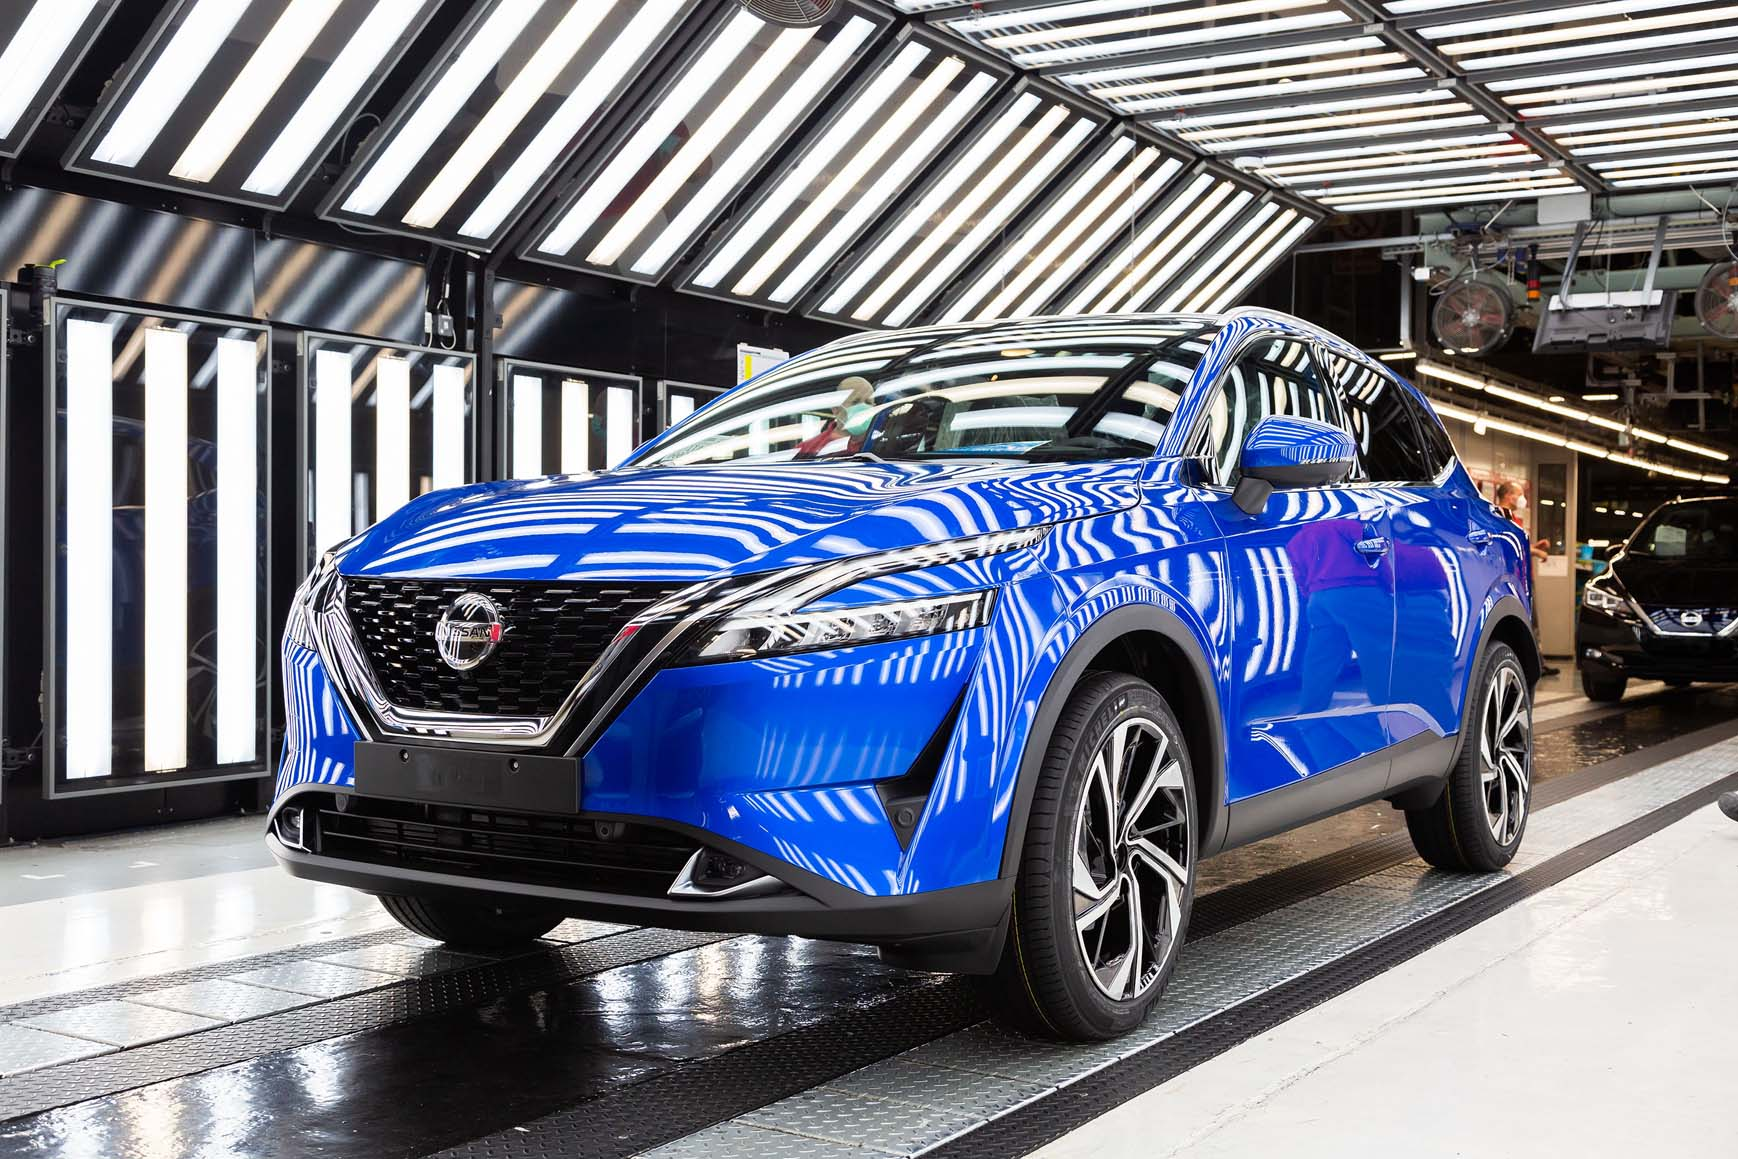 Qashqai TC 2 Nissan : ξεκινά την παραγωγή του νέου Qashqai και προσφέρει μια εμπειρία δεξιοτήτων σε κάθε μαθητή Nissan, Nissan Qashqai, Qashqai, ειδήσεις, Νέα